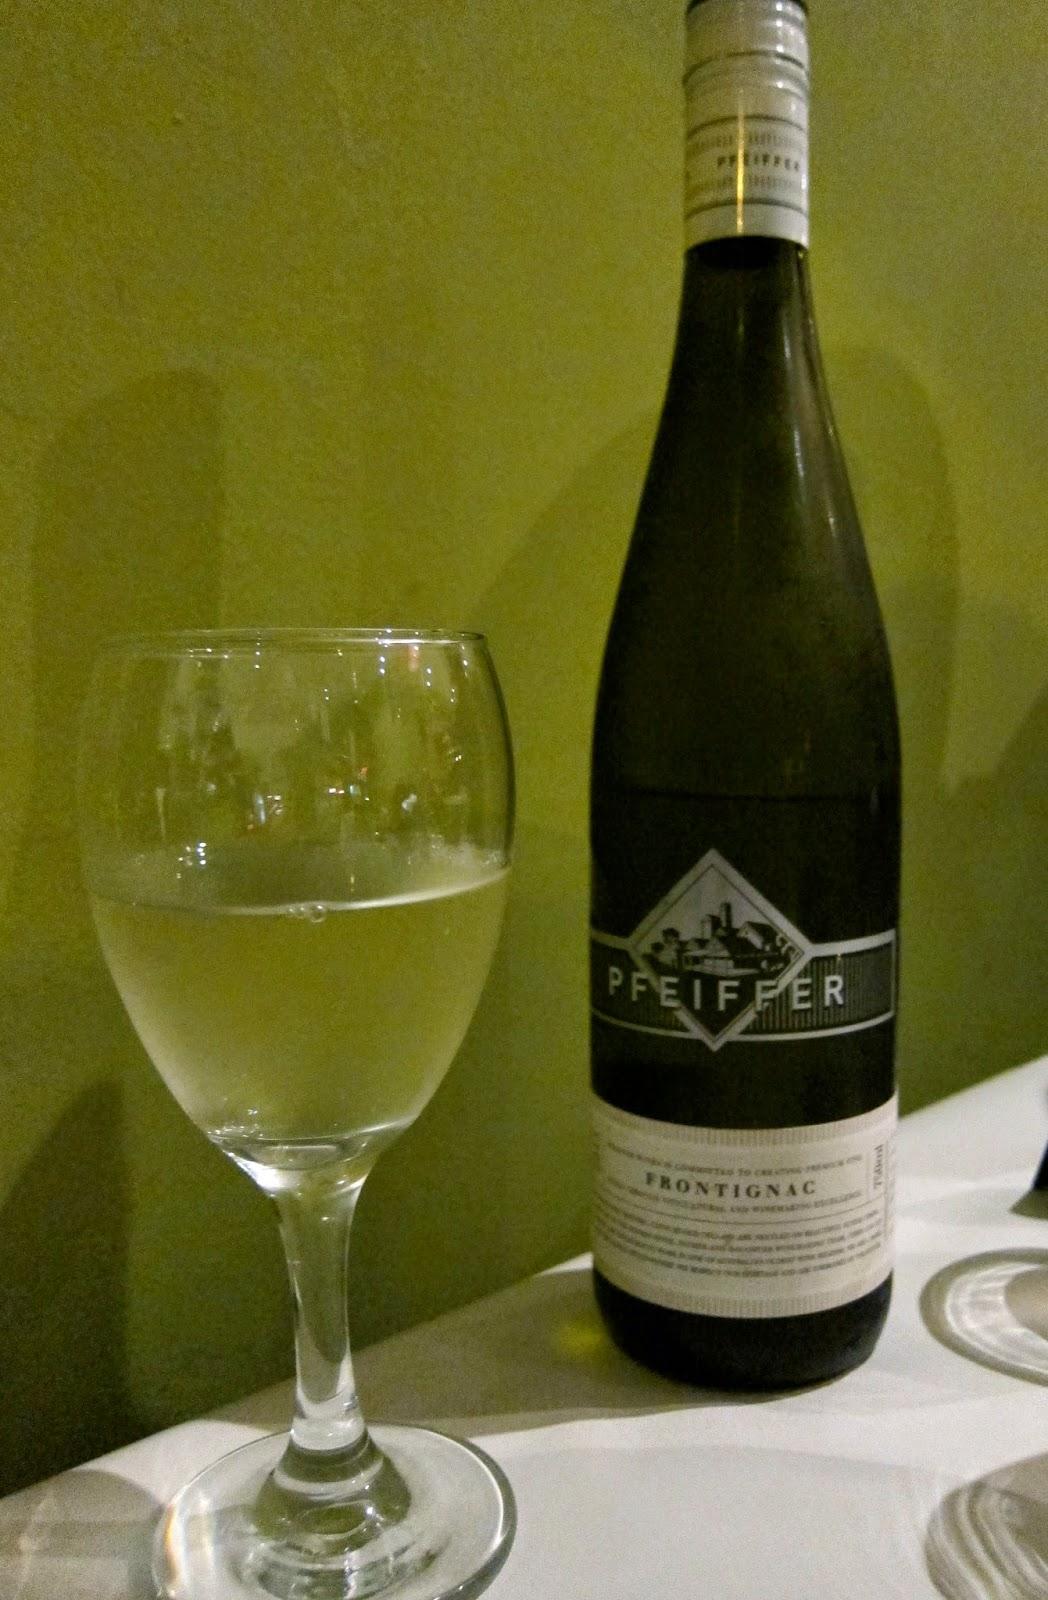 pfeiffer frontignac wine